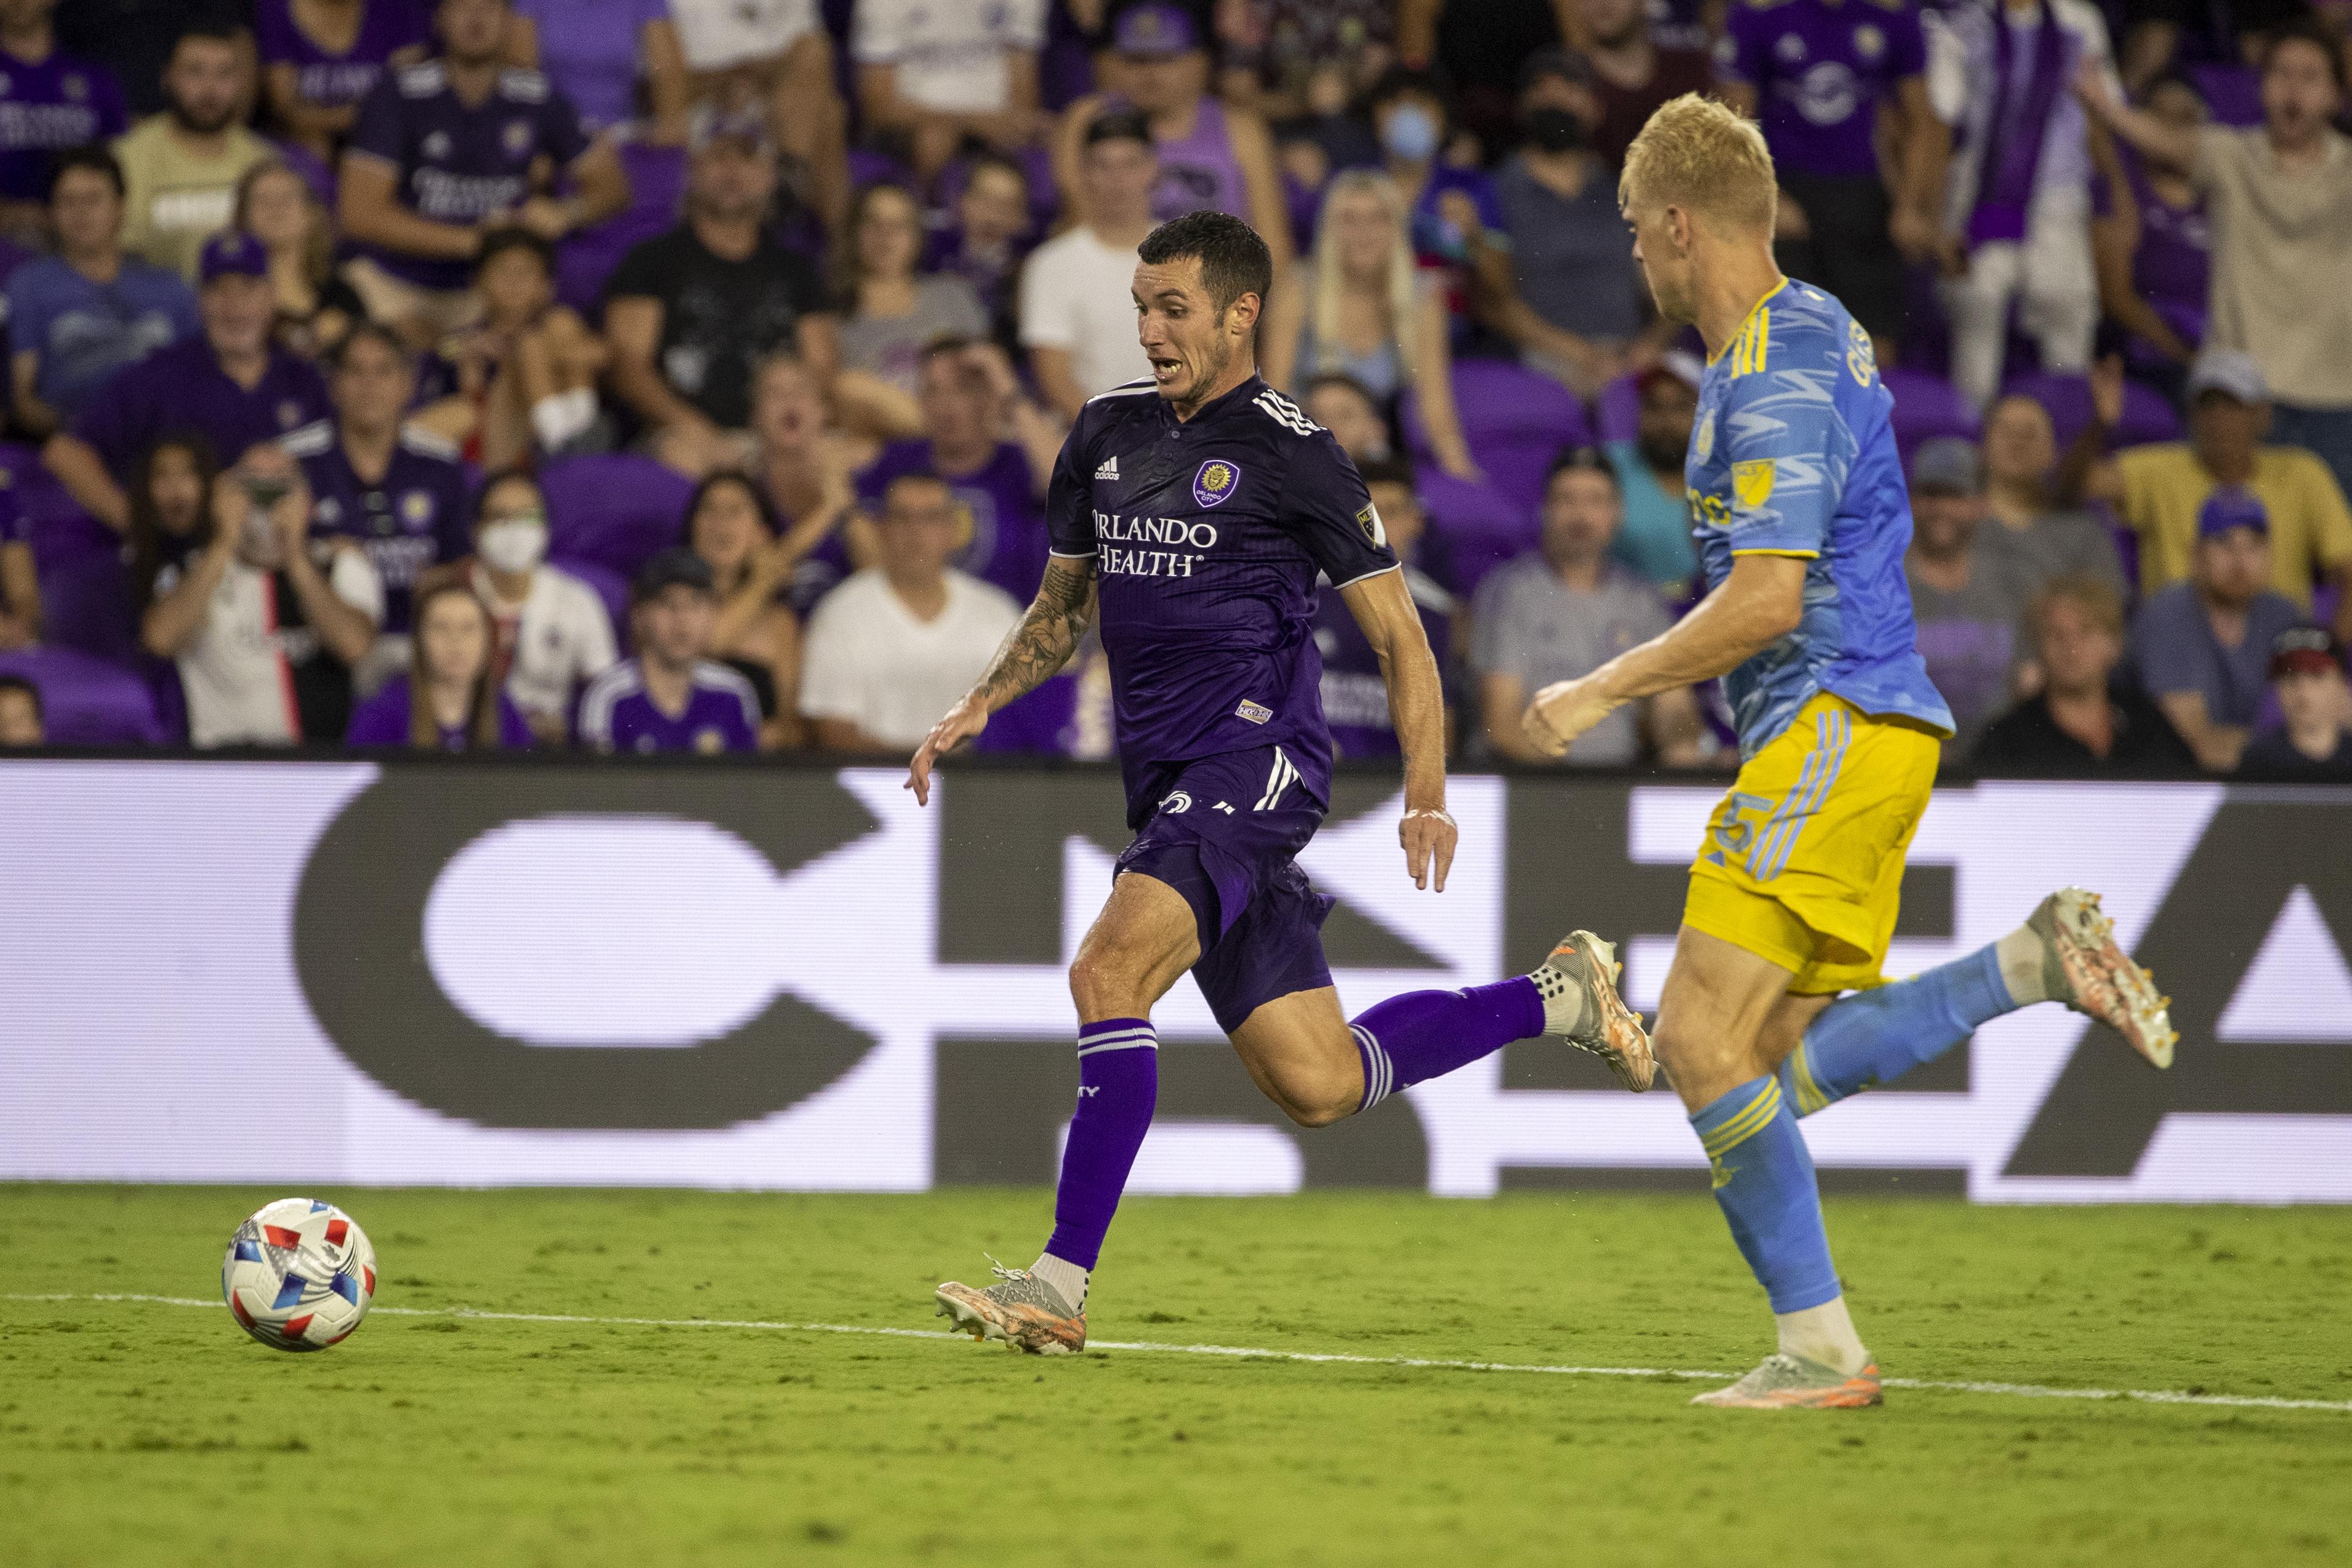 SOCCER: JUL 22 MLS - Philadelphia Union at Orlando City SC